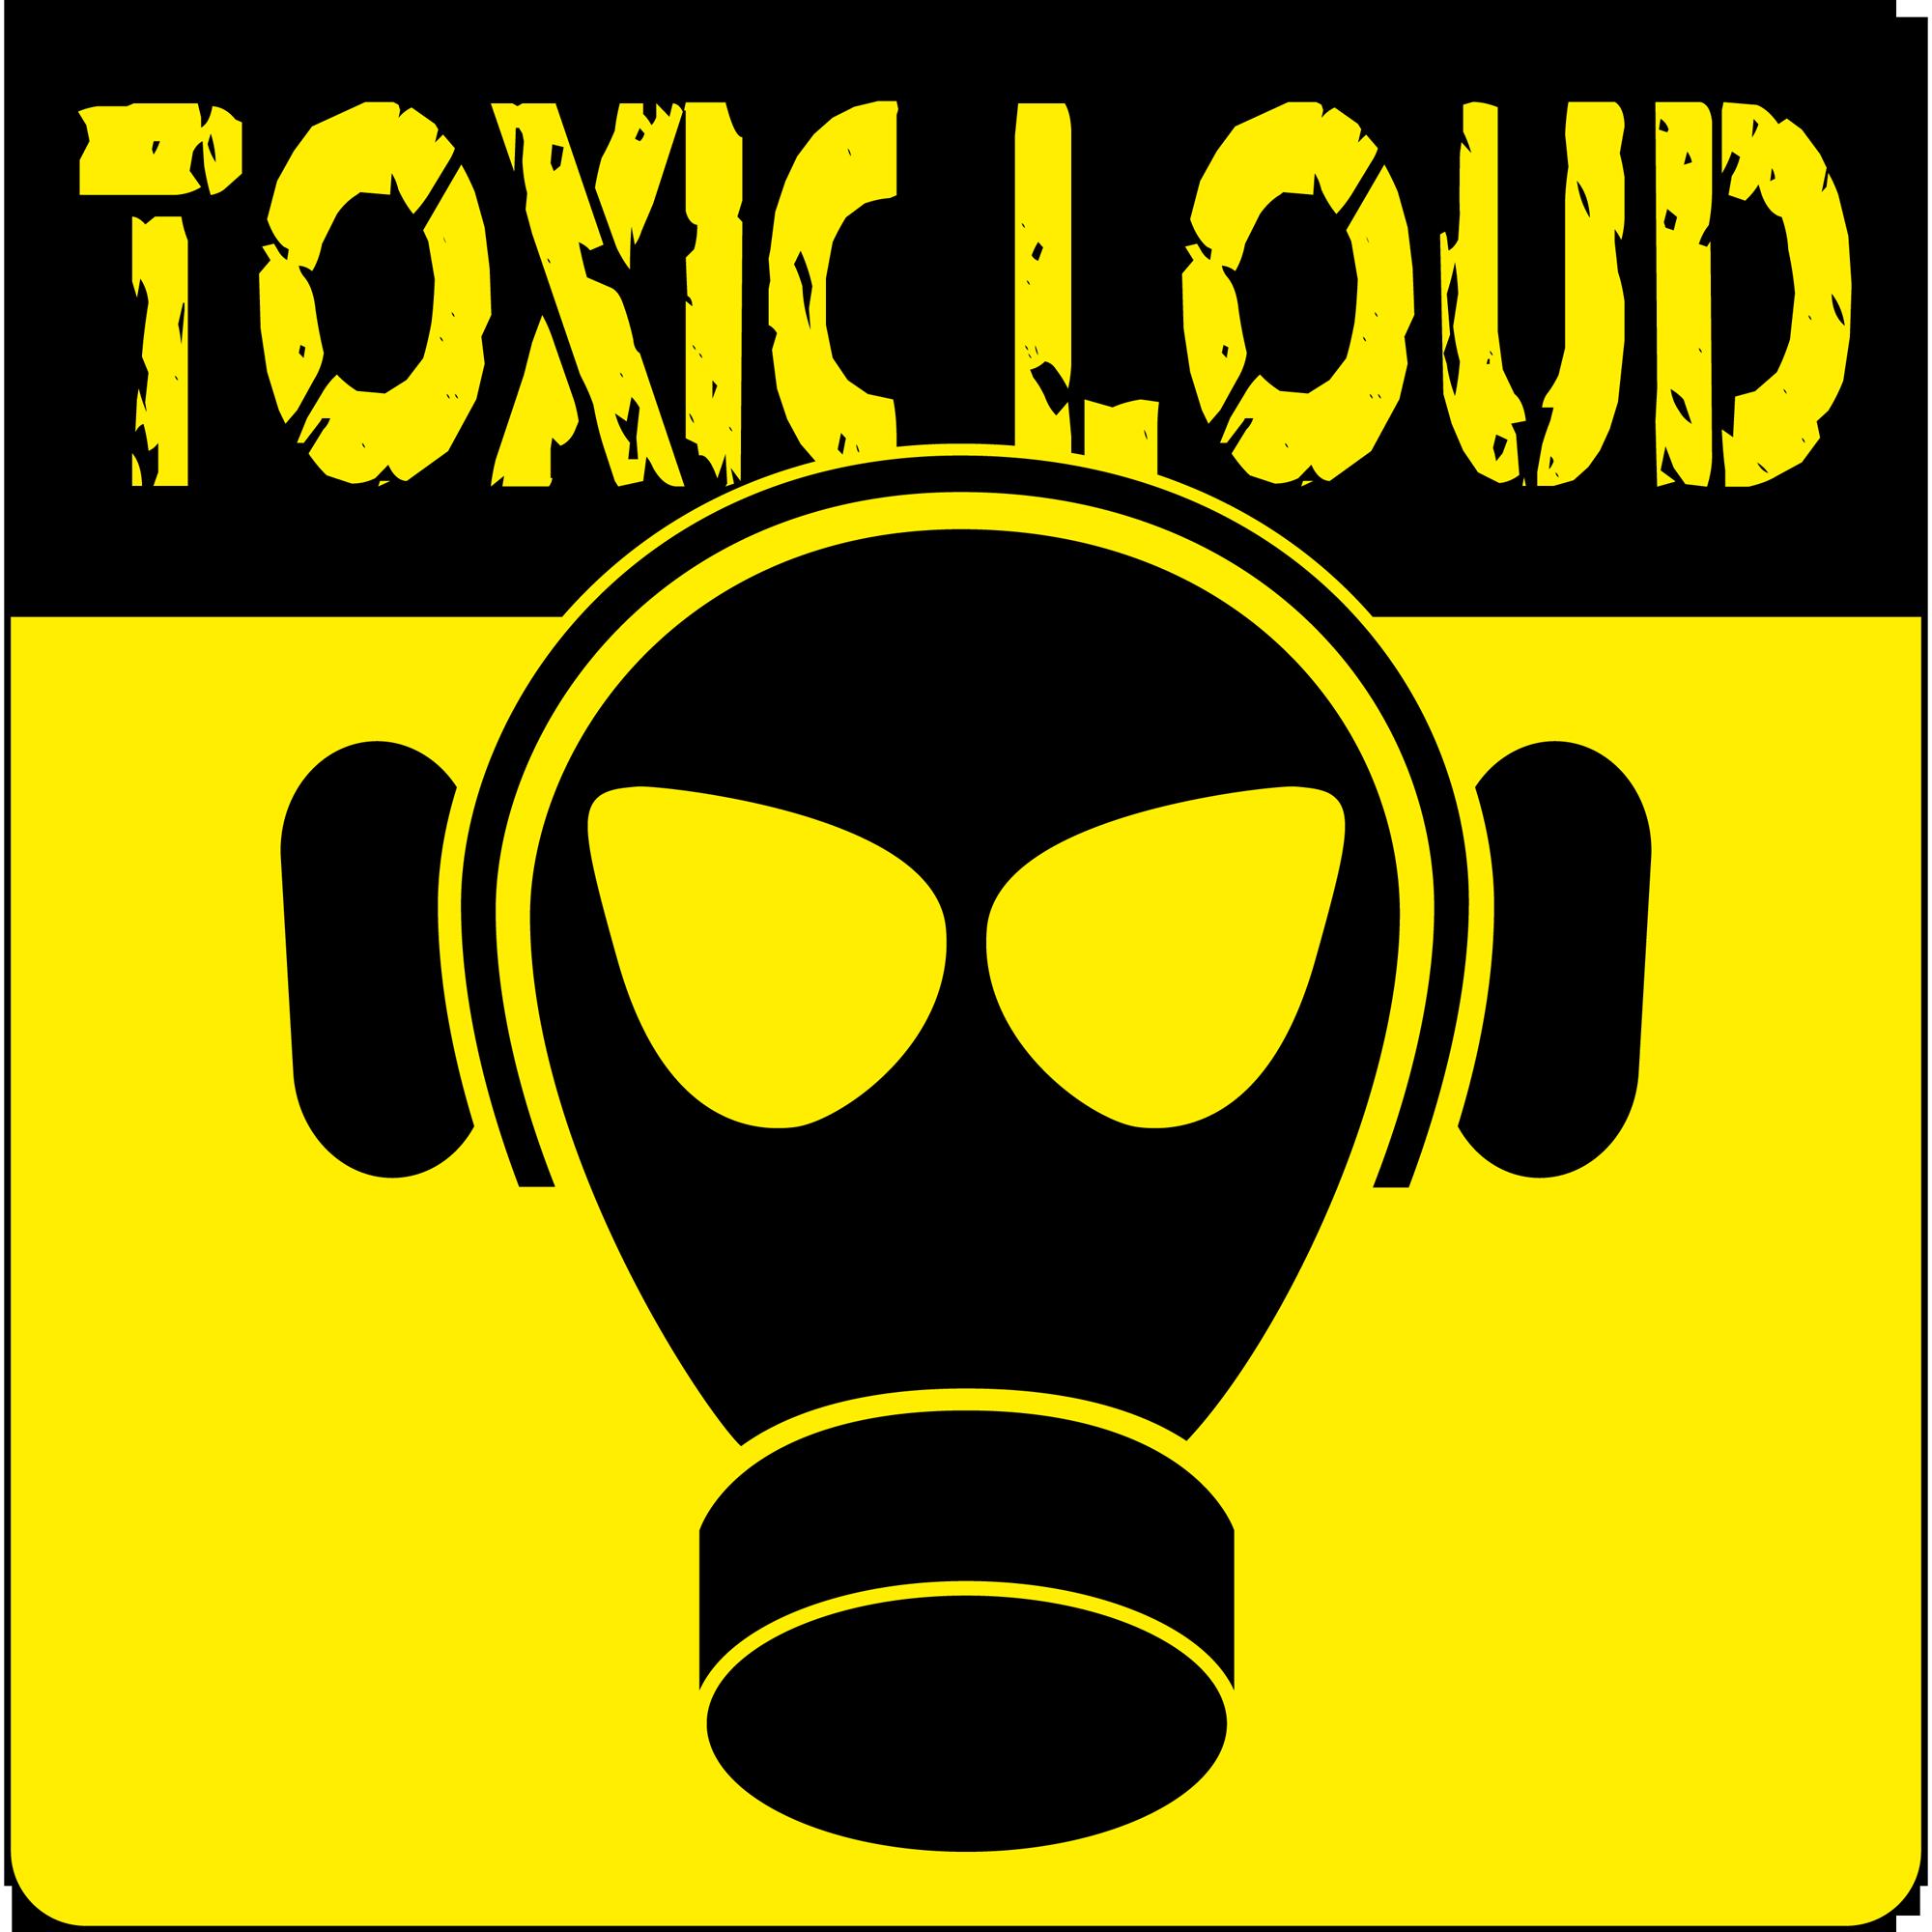 logo toxicloud 96khz productions